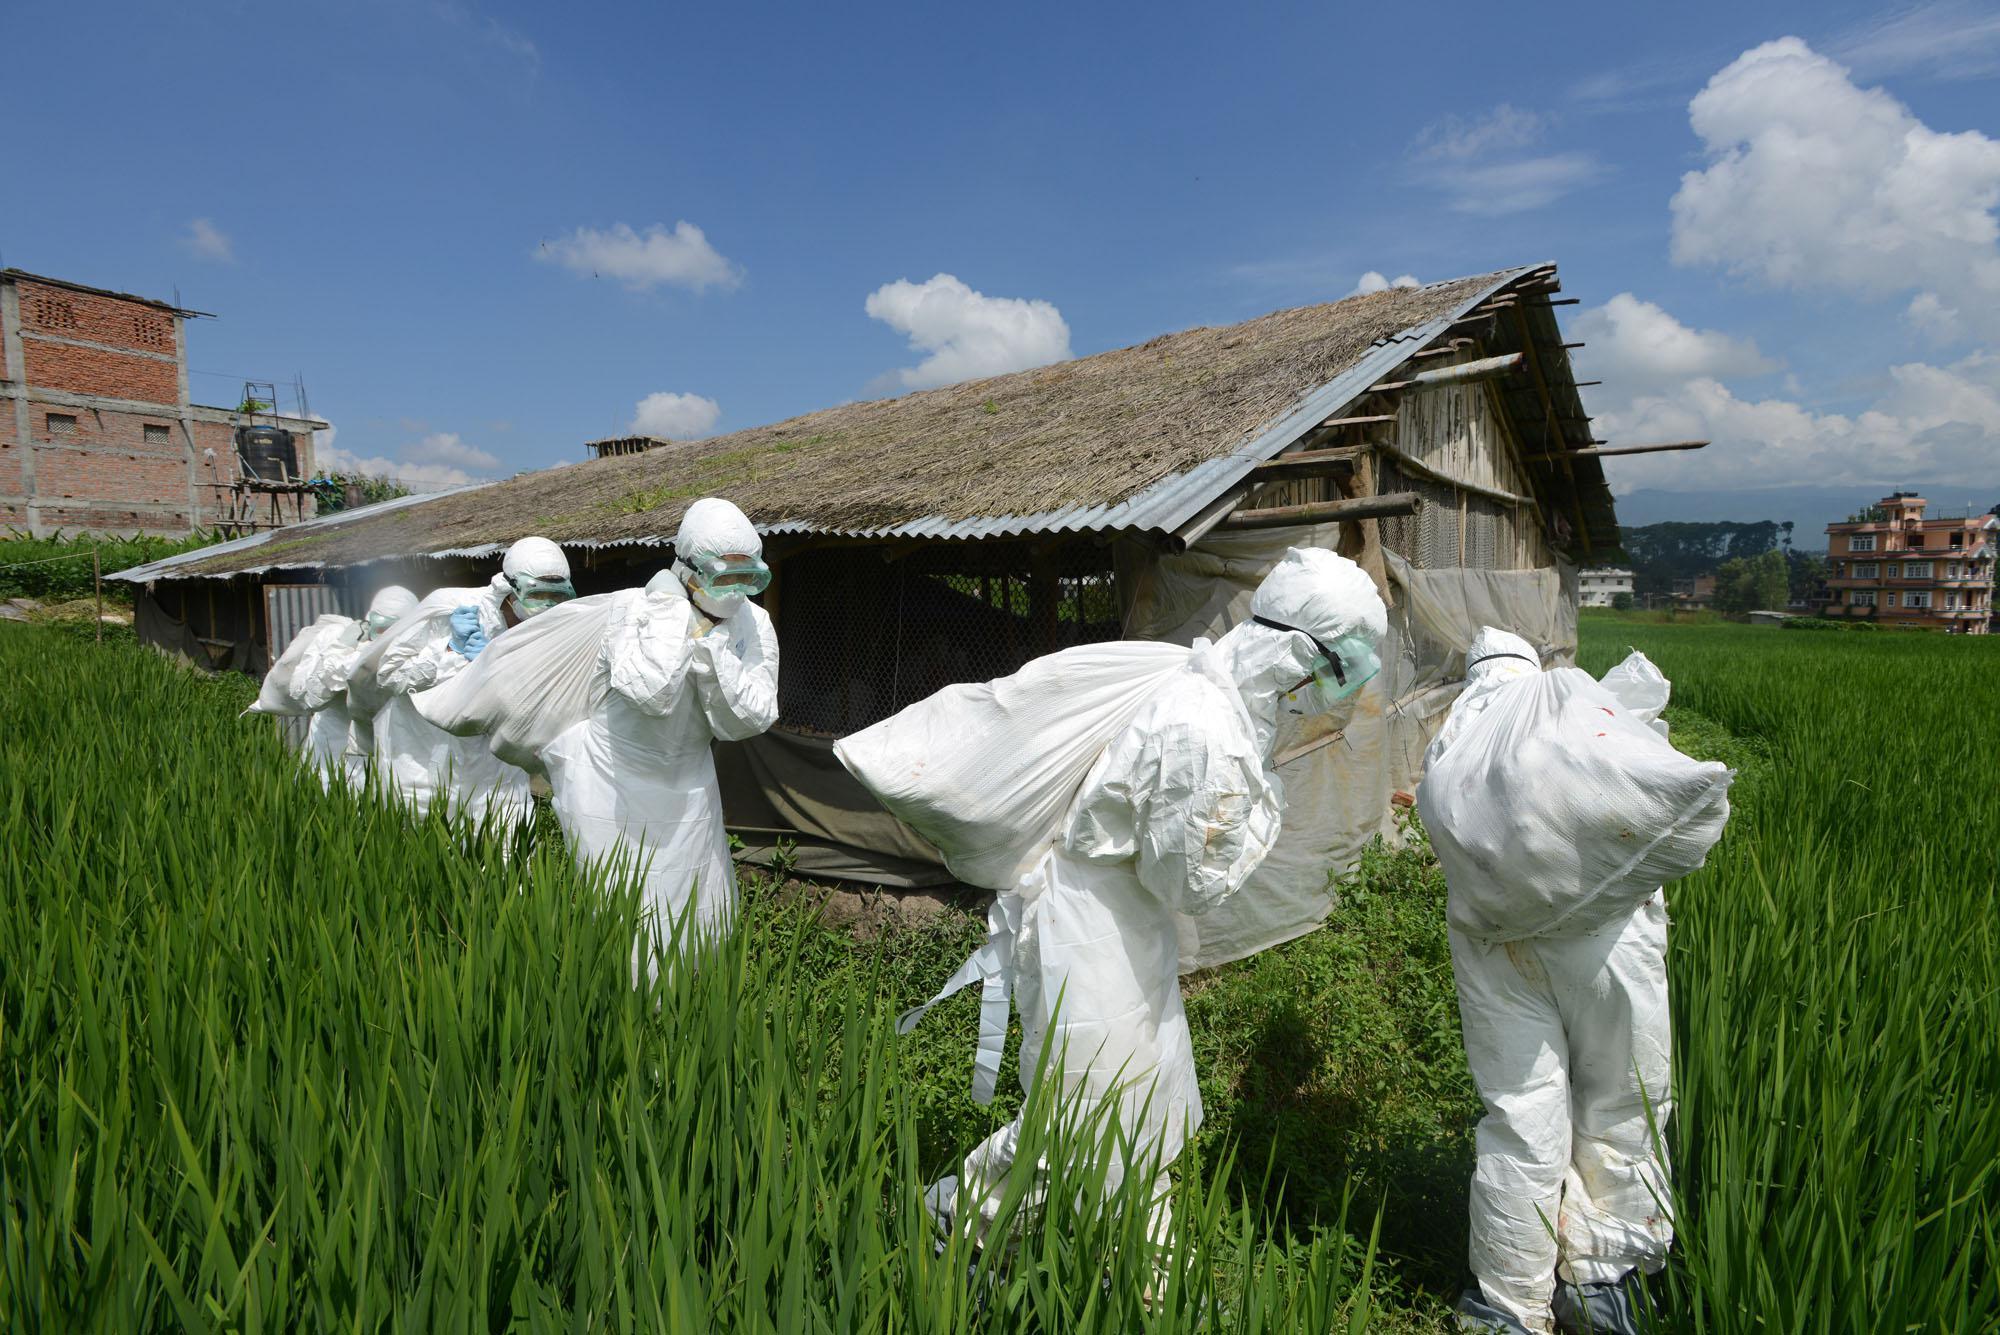 Netherlands Overhauls Biosecurity Rules as Avian Flu Dispute Simmers